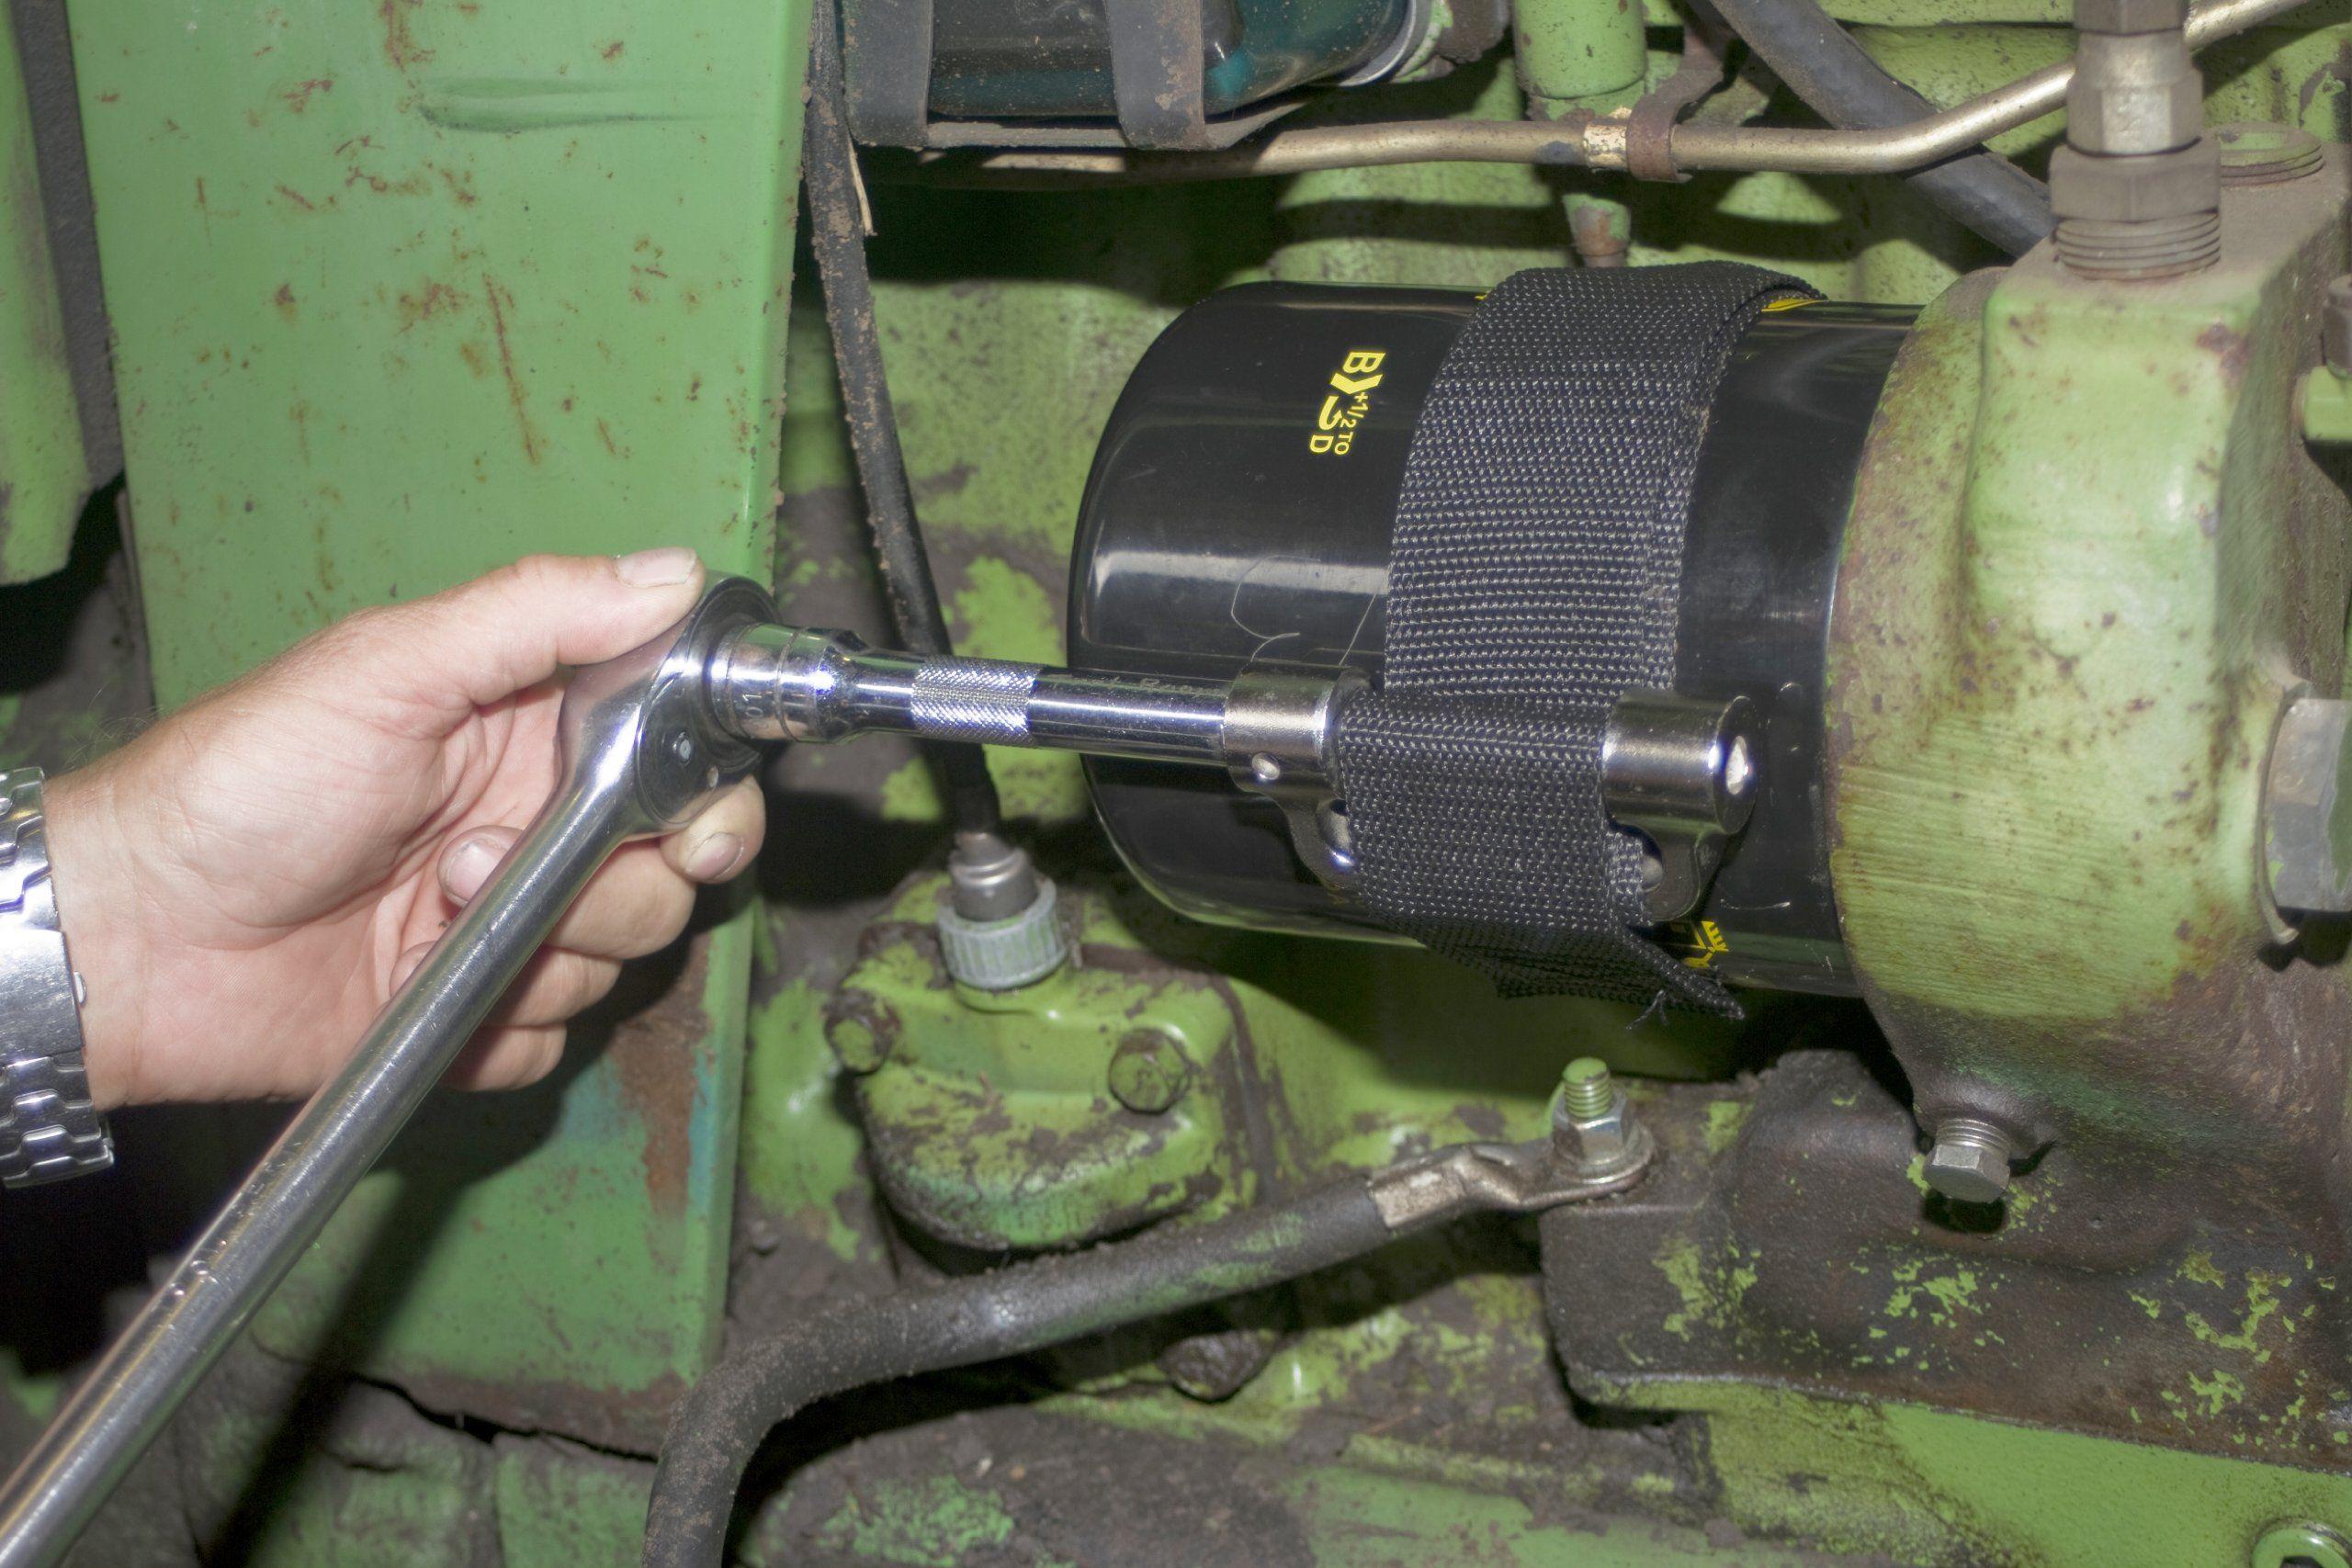 Lisle 60200 Heavy Duty Strap Filter Wrench Heavy Lisle Duty